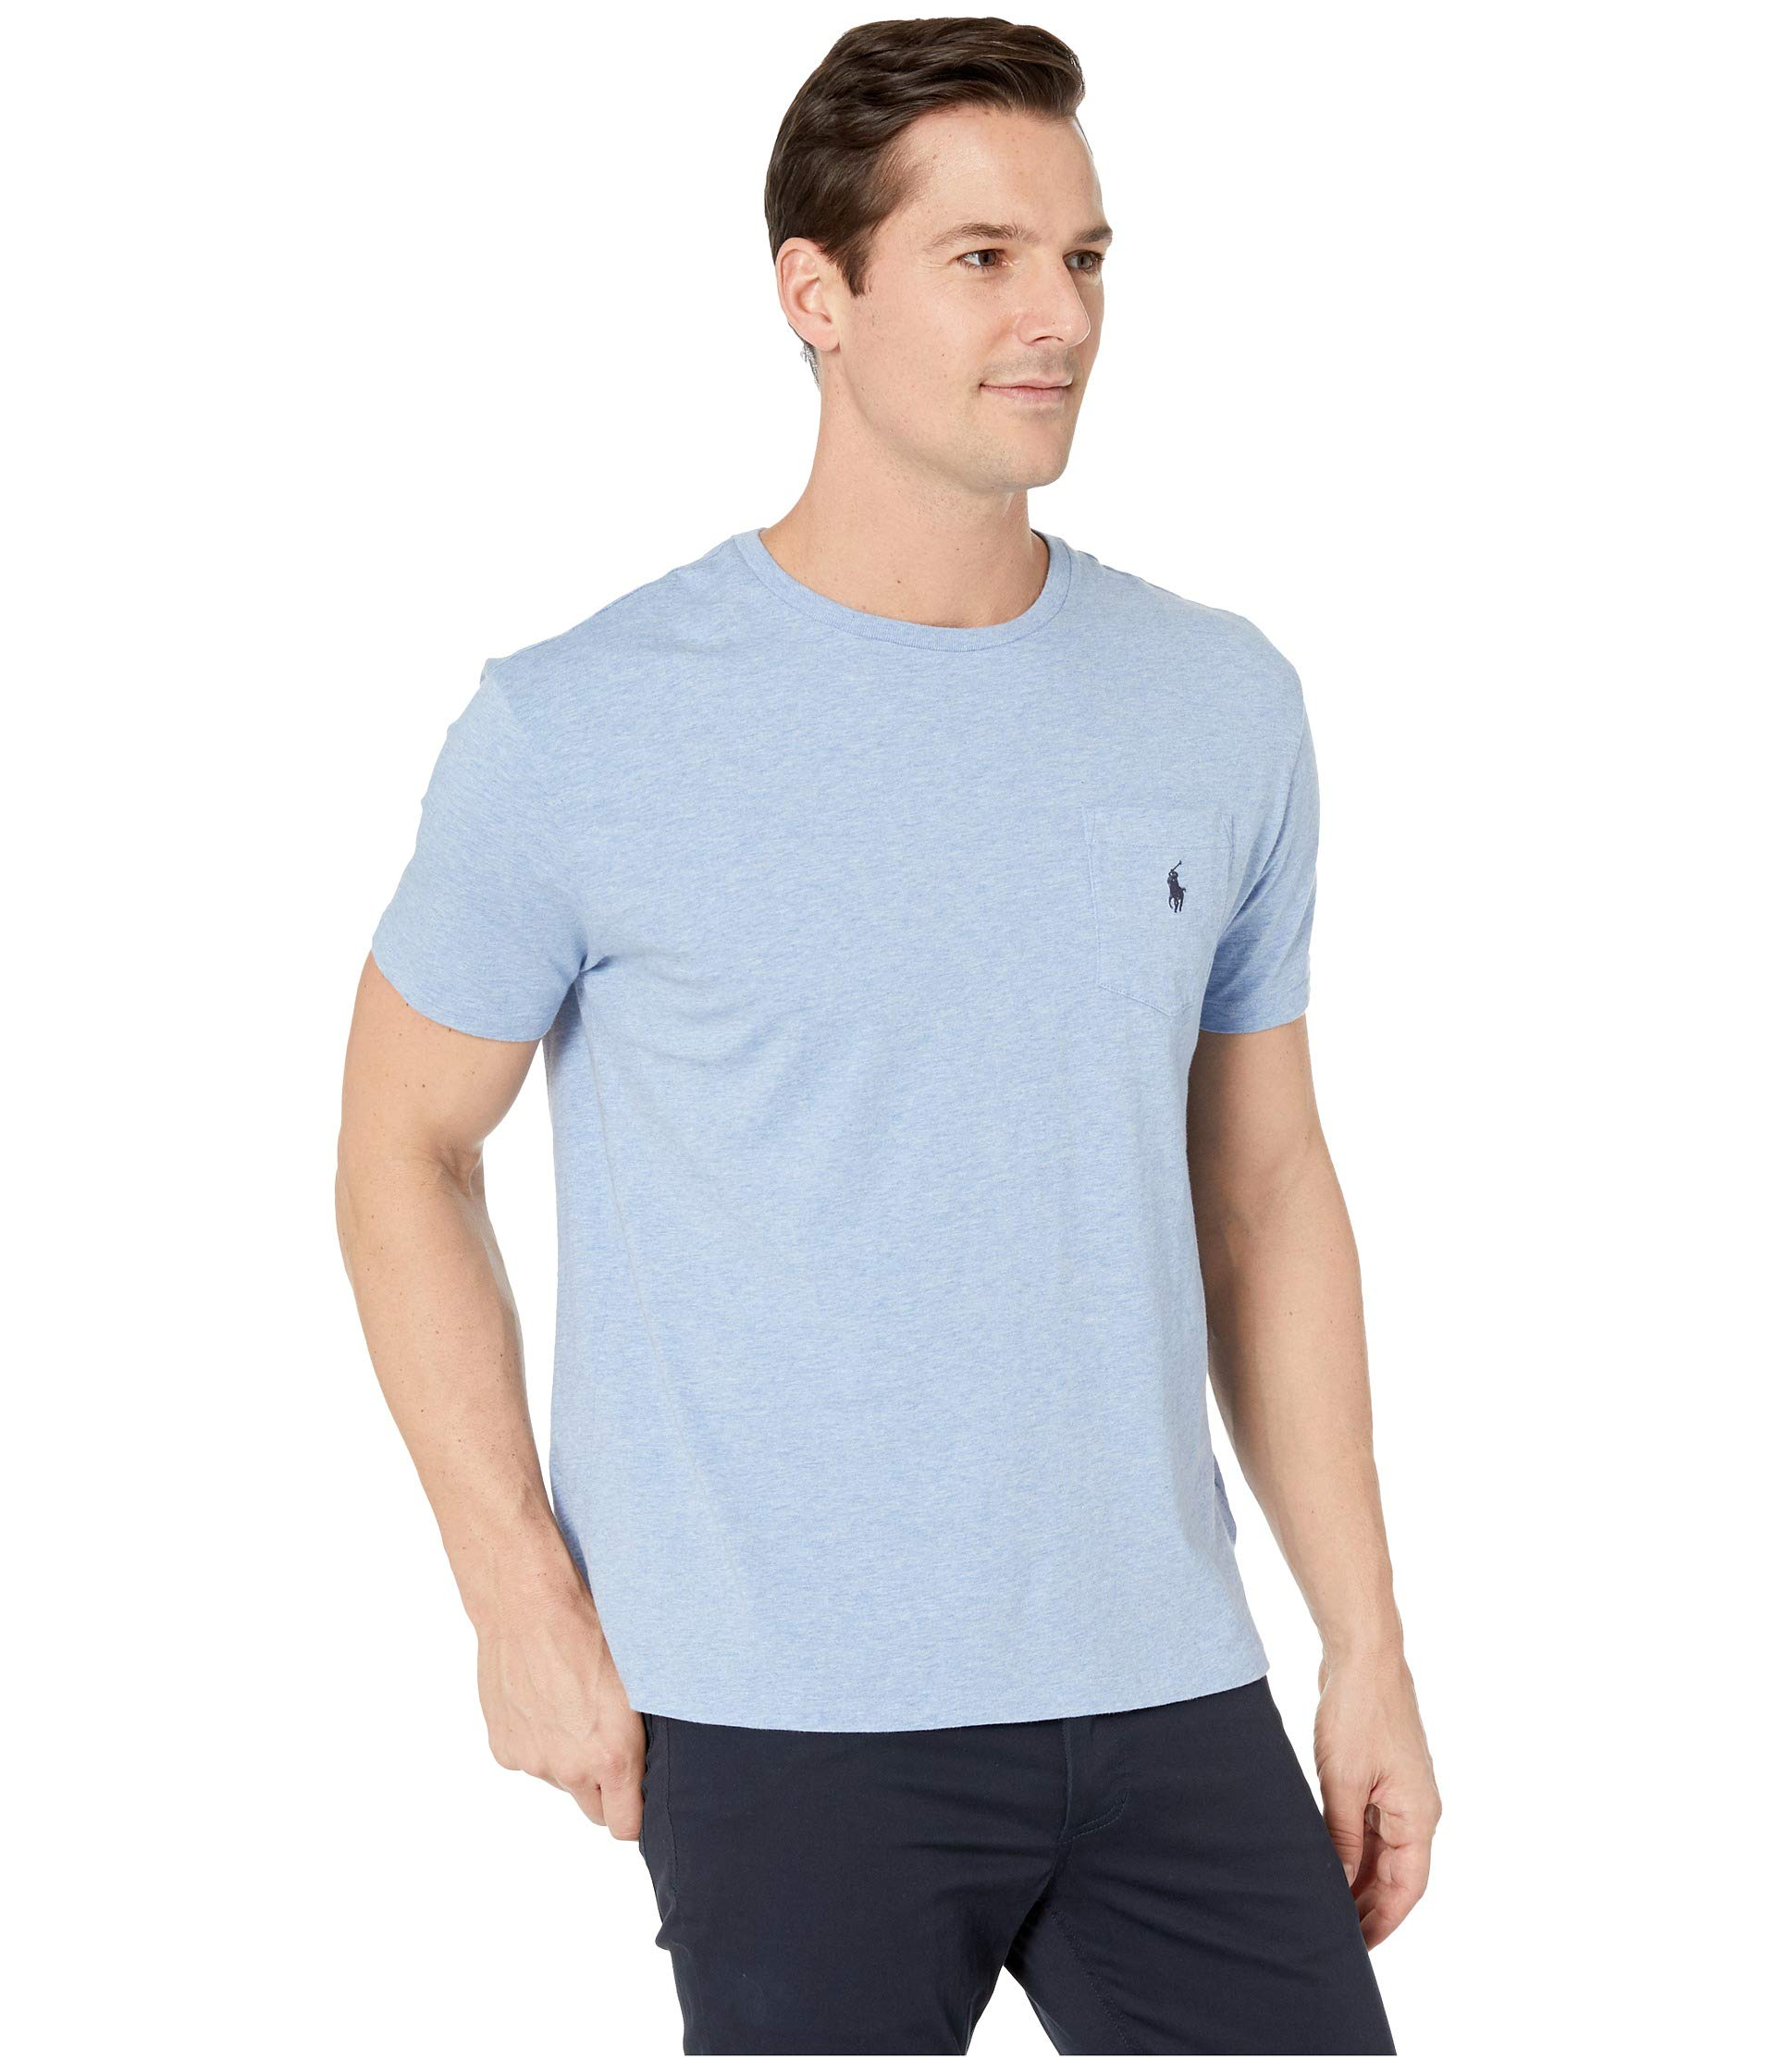 1 Short Heather Pocket Fit Jersey Sleeve Ralph shirt T Lauren Polo Jamaica Classic 26 wqXSxUgntO